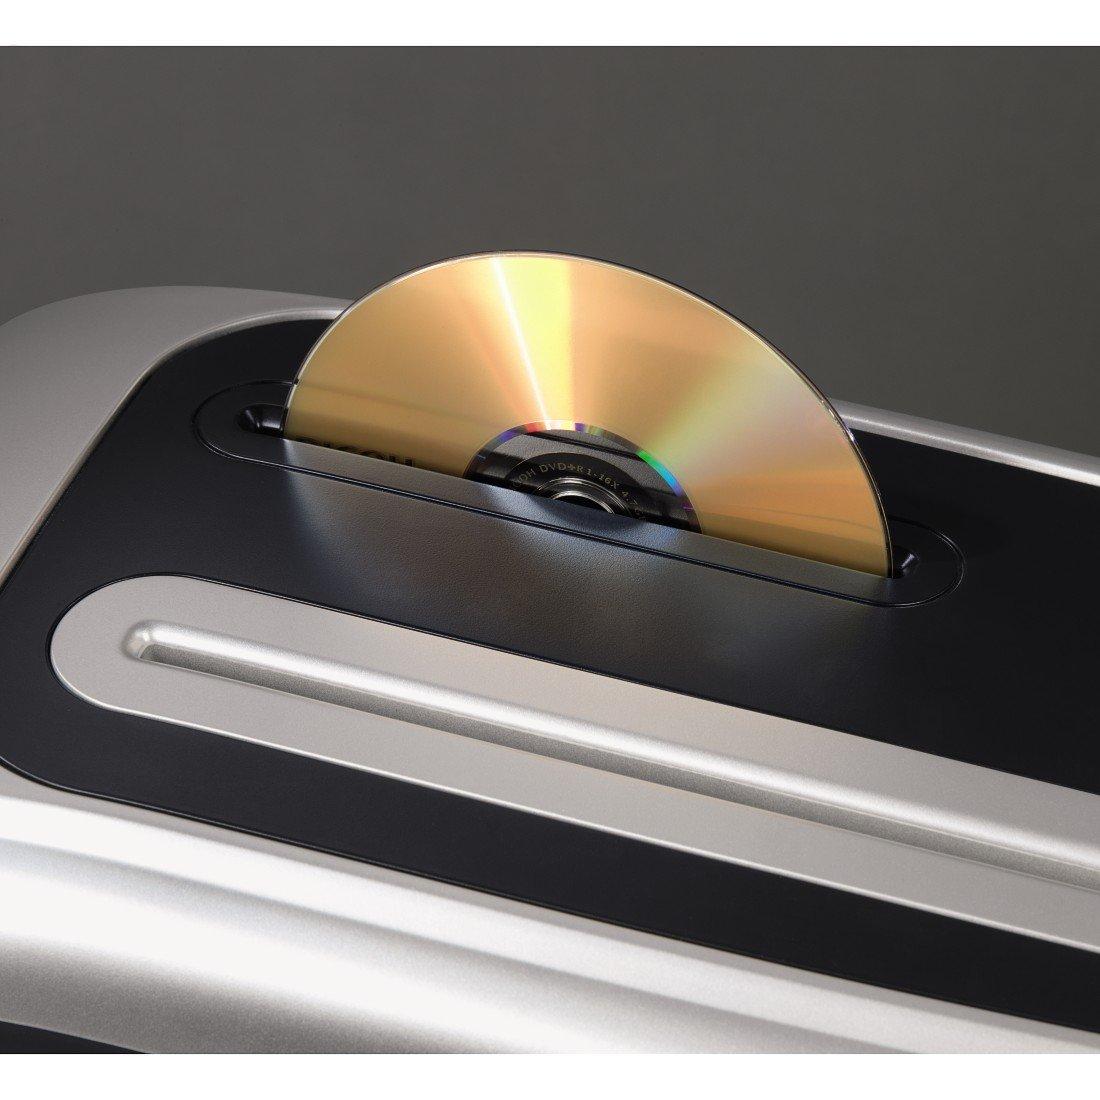 Hama Distruggi documenti elettricoM8CD